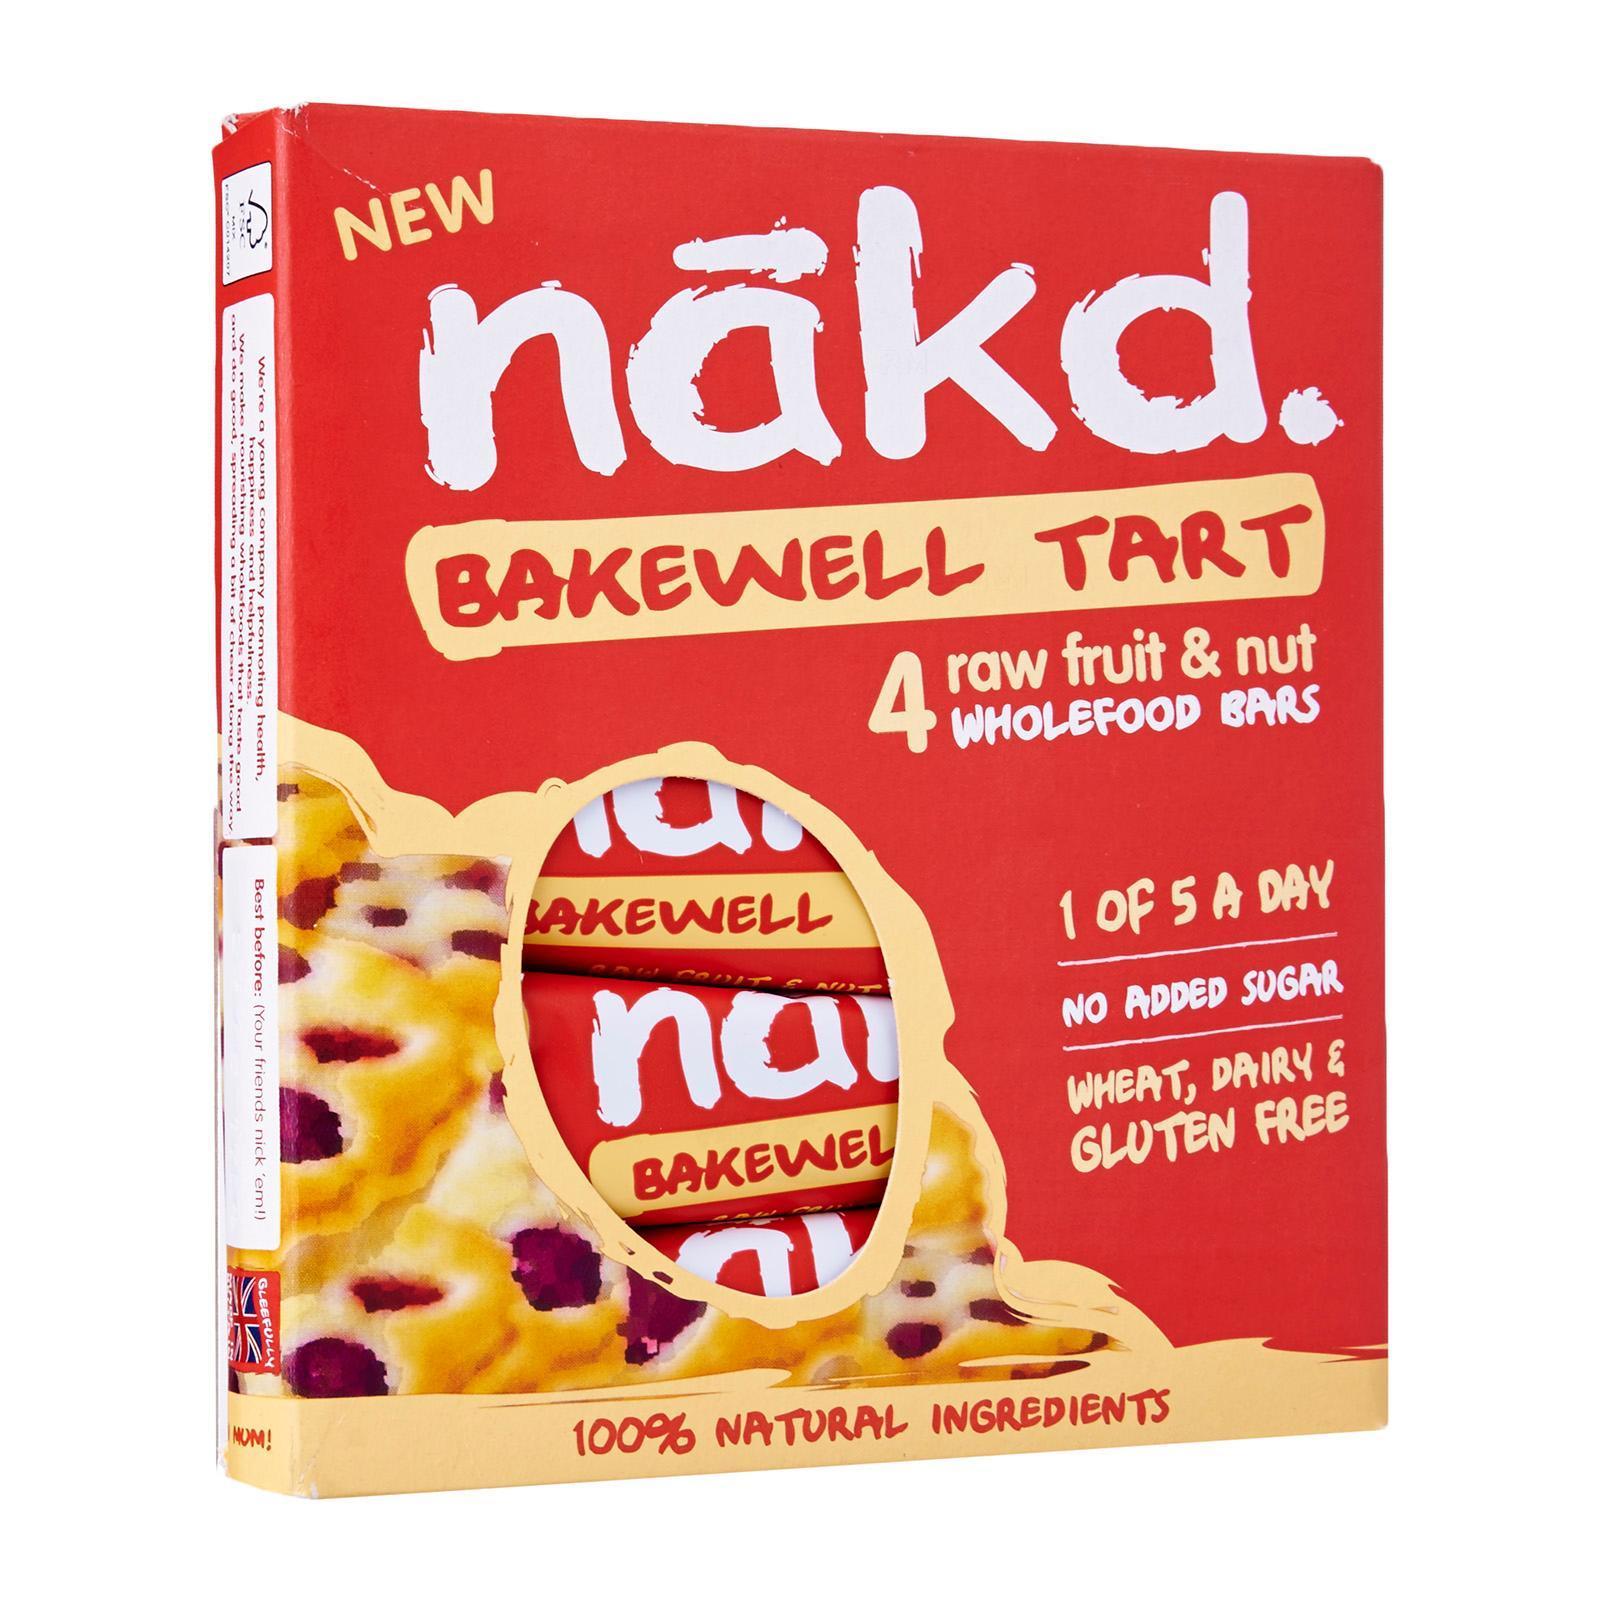 Nakd Gluten Free Bakewell Tart Raw Fruit And Nut Wholefood Bars